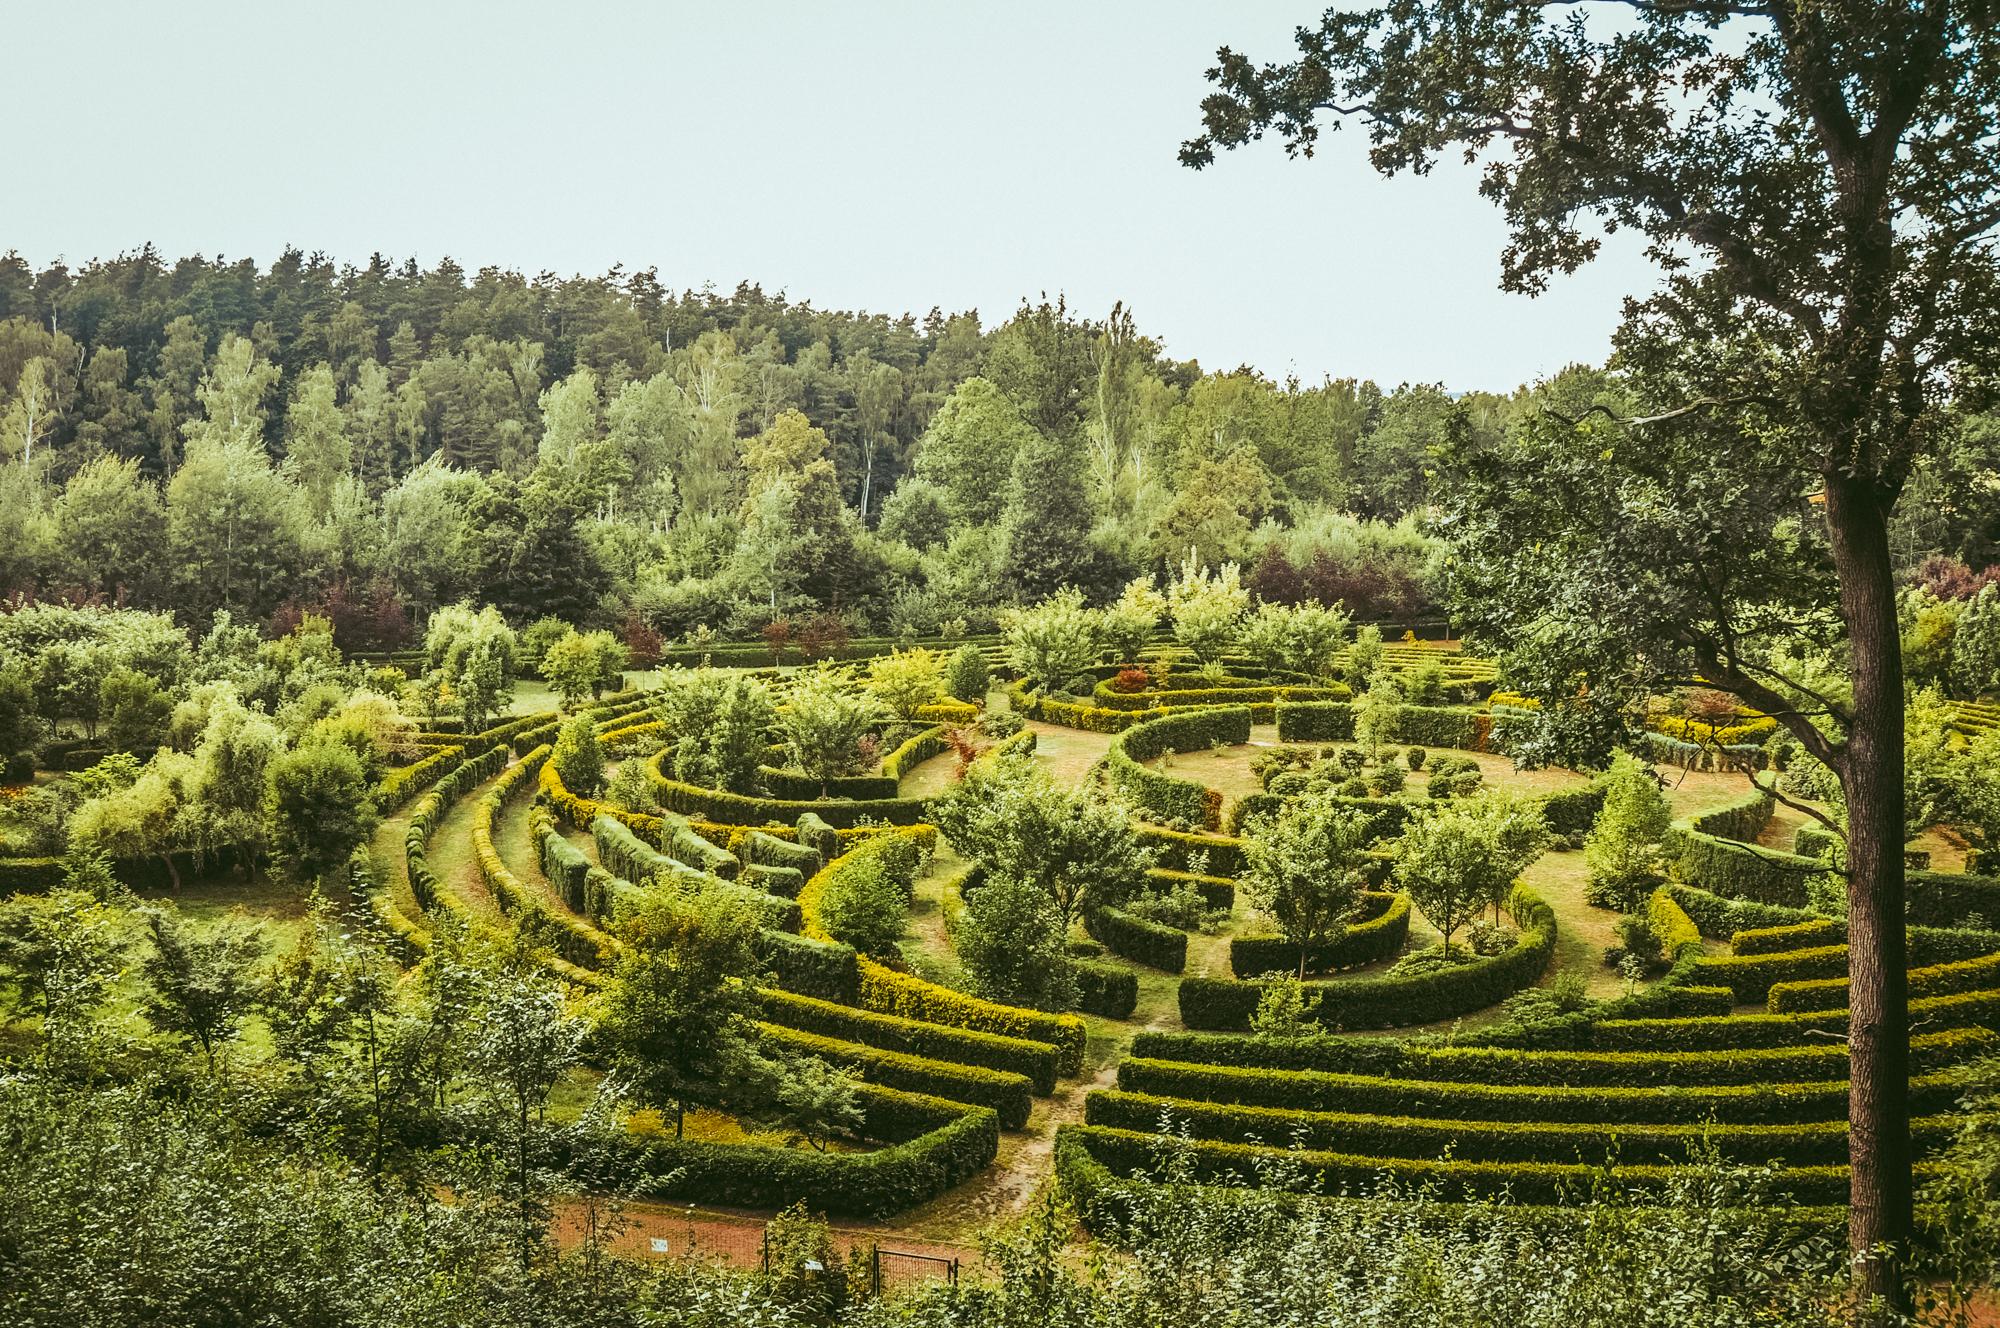 Arboretum Bramy Morawskiej Racibórz piękny ogród na spacer